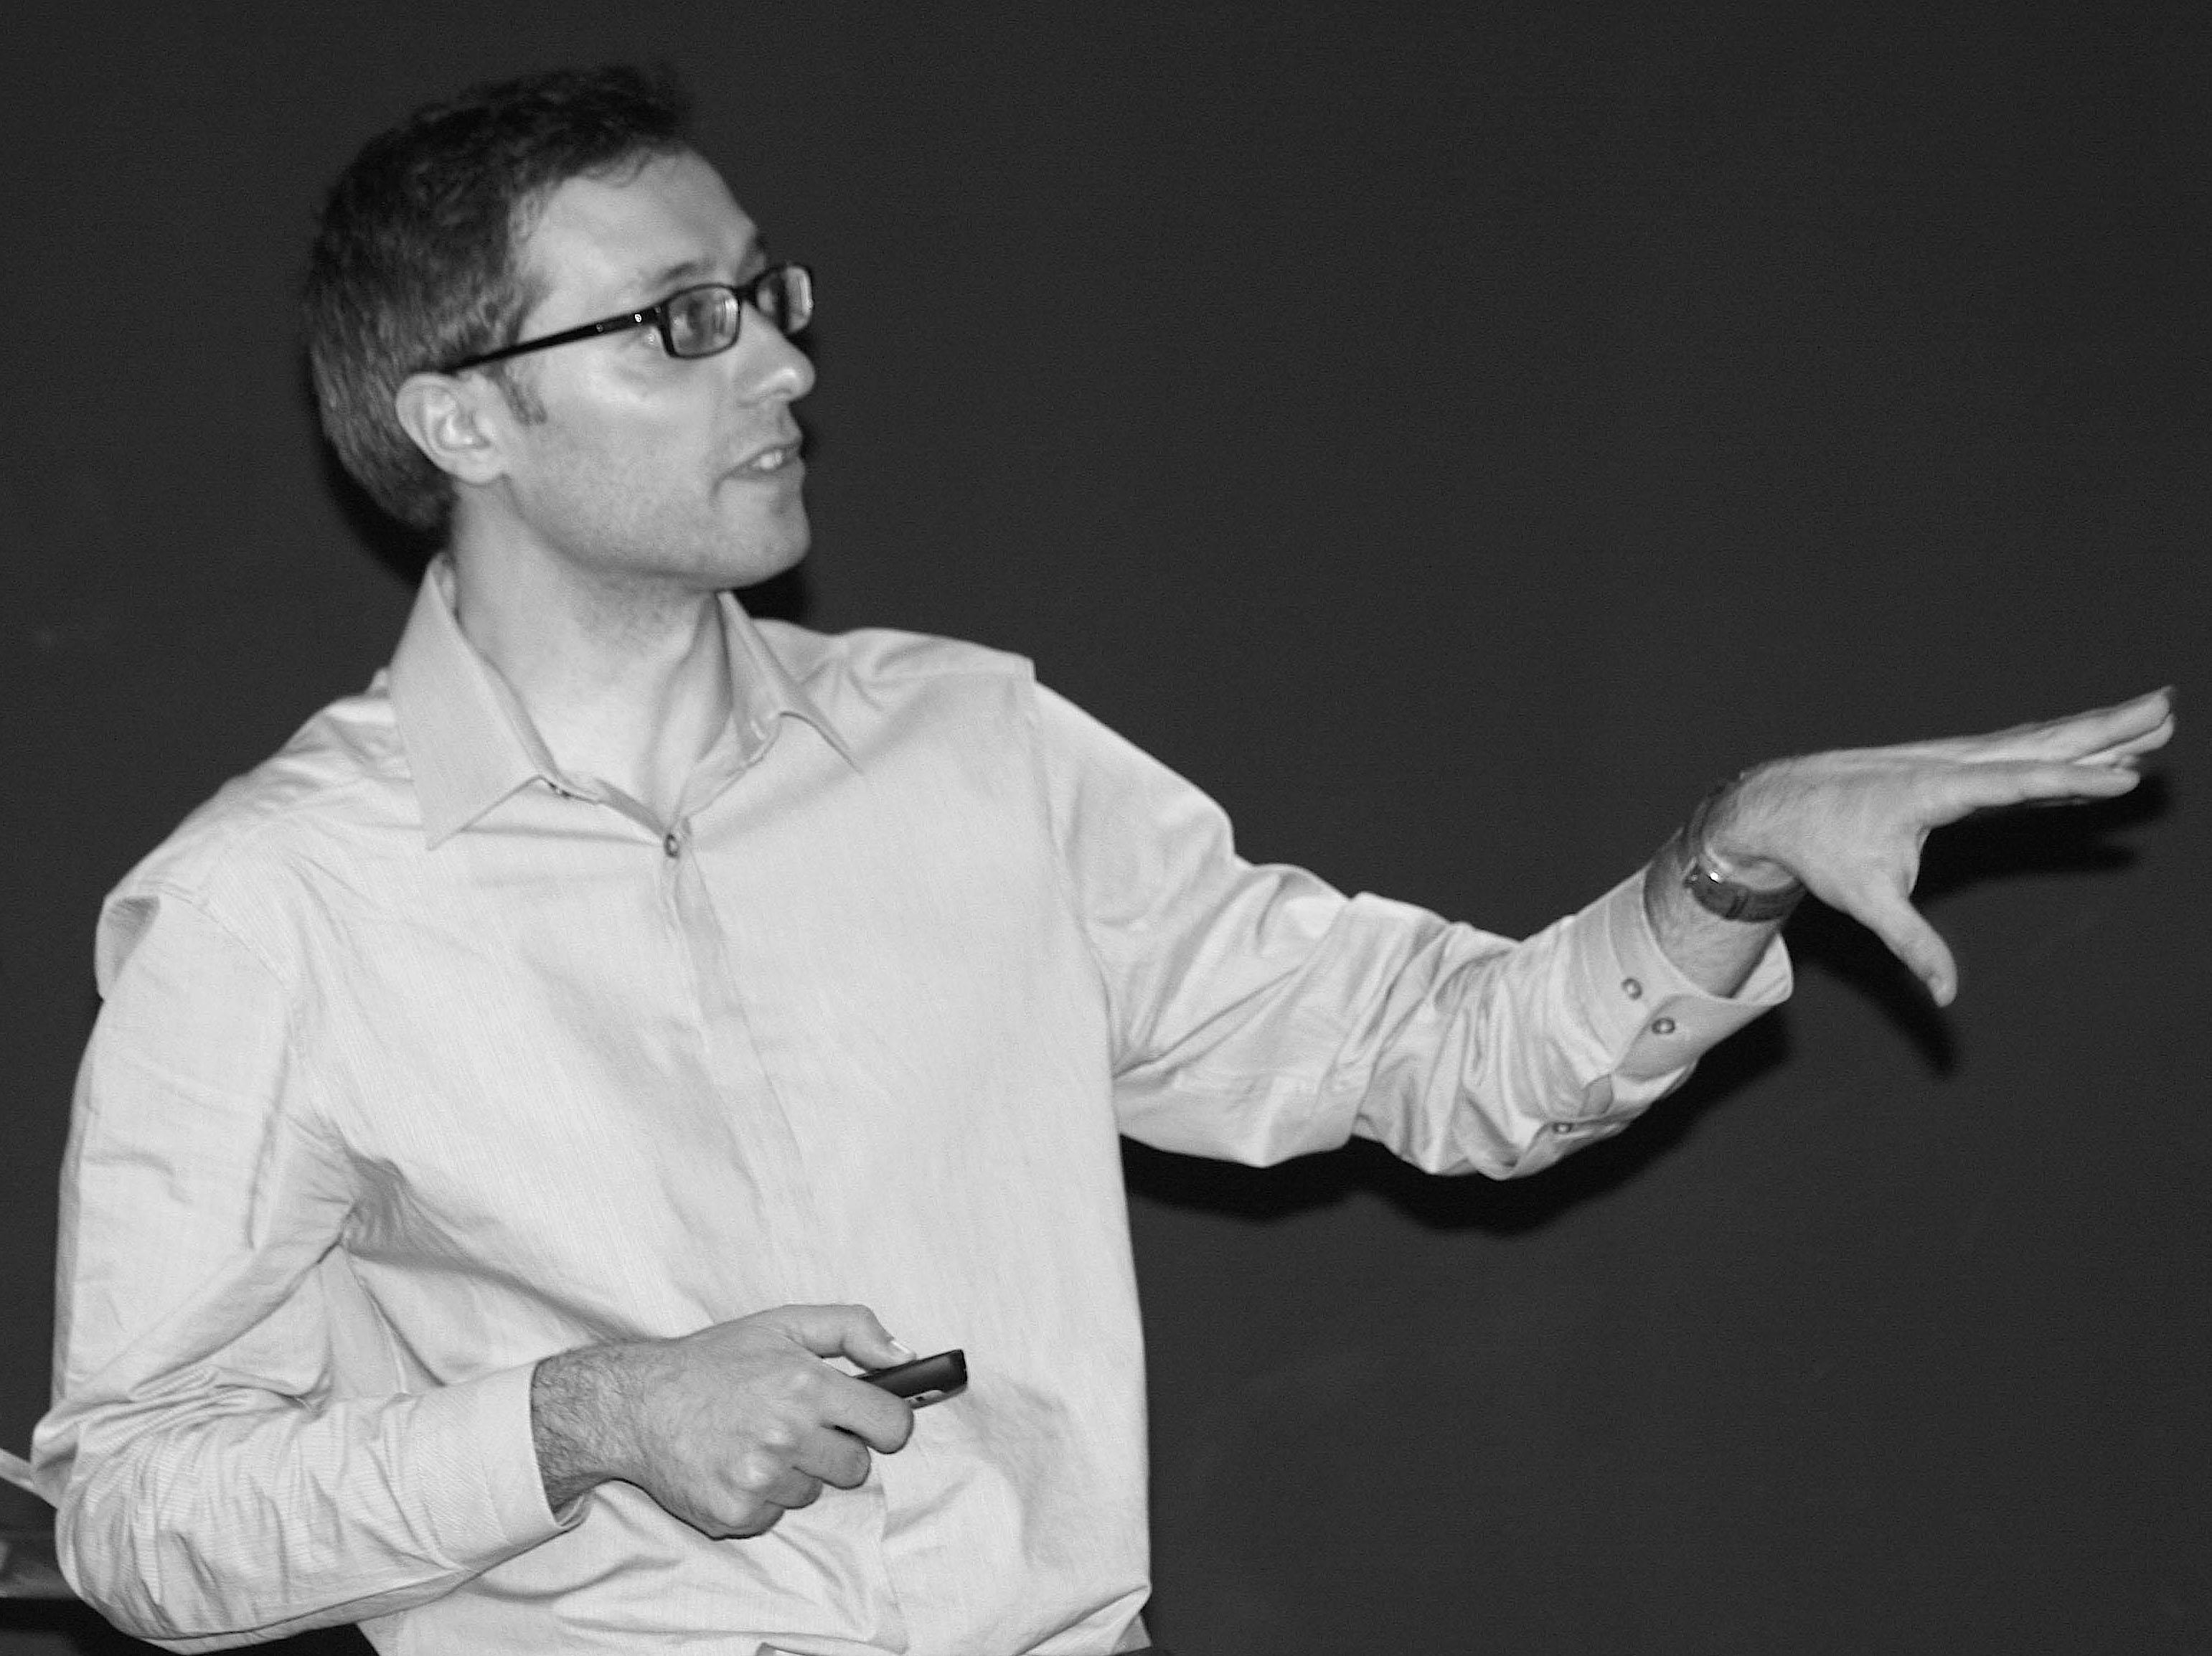 Da Avellino a Houston passando per Napoli: il giovane scienziato Sandulli premiato